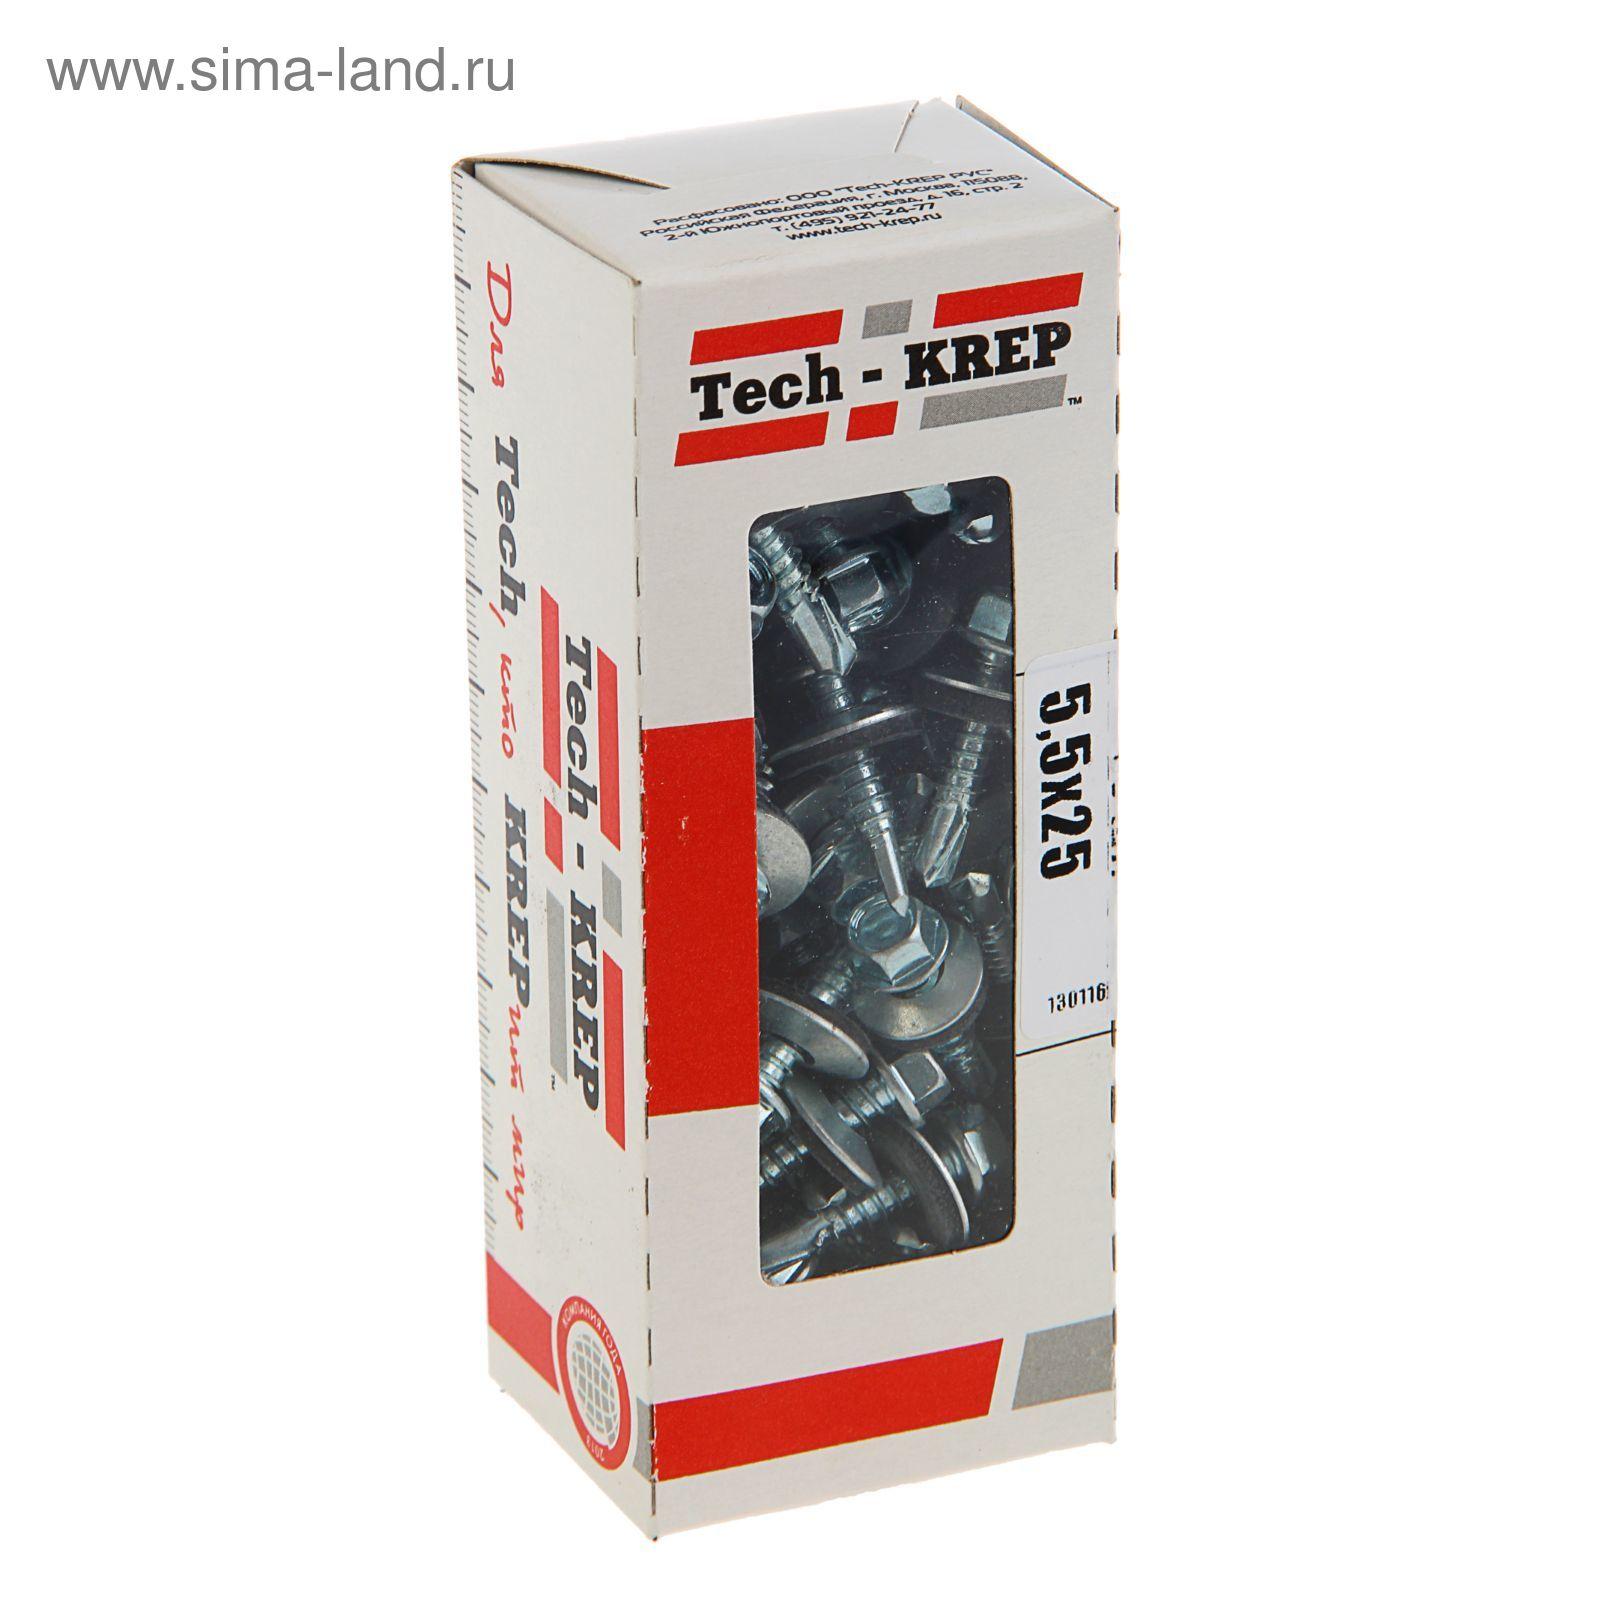 Саморезы кровельные TECH-KREP, 5.5х25 мм, сверло, цинк, с шайбой, 60 ... 777ba96102b